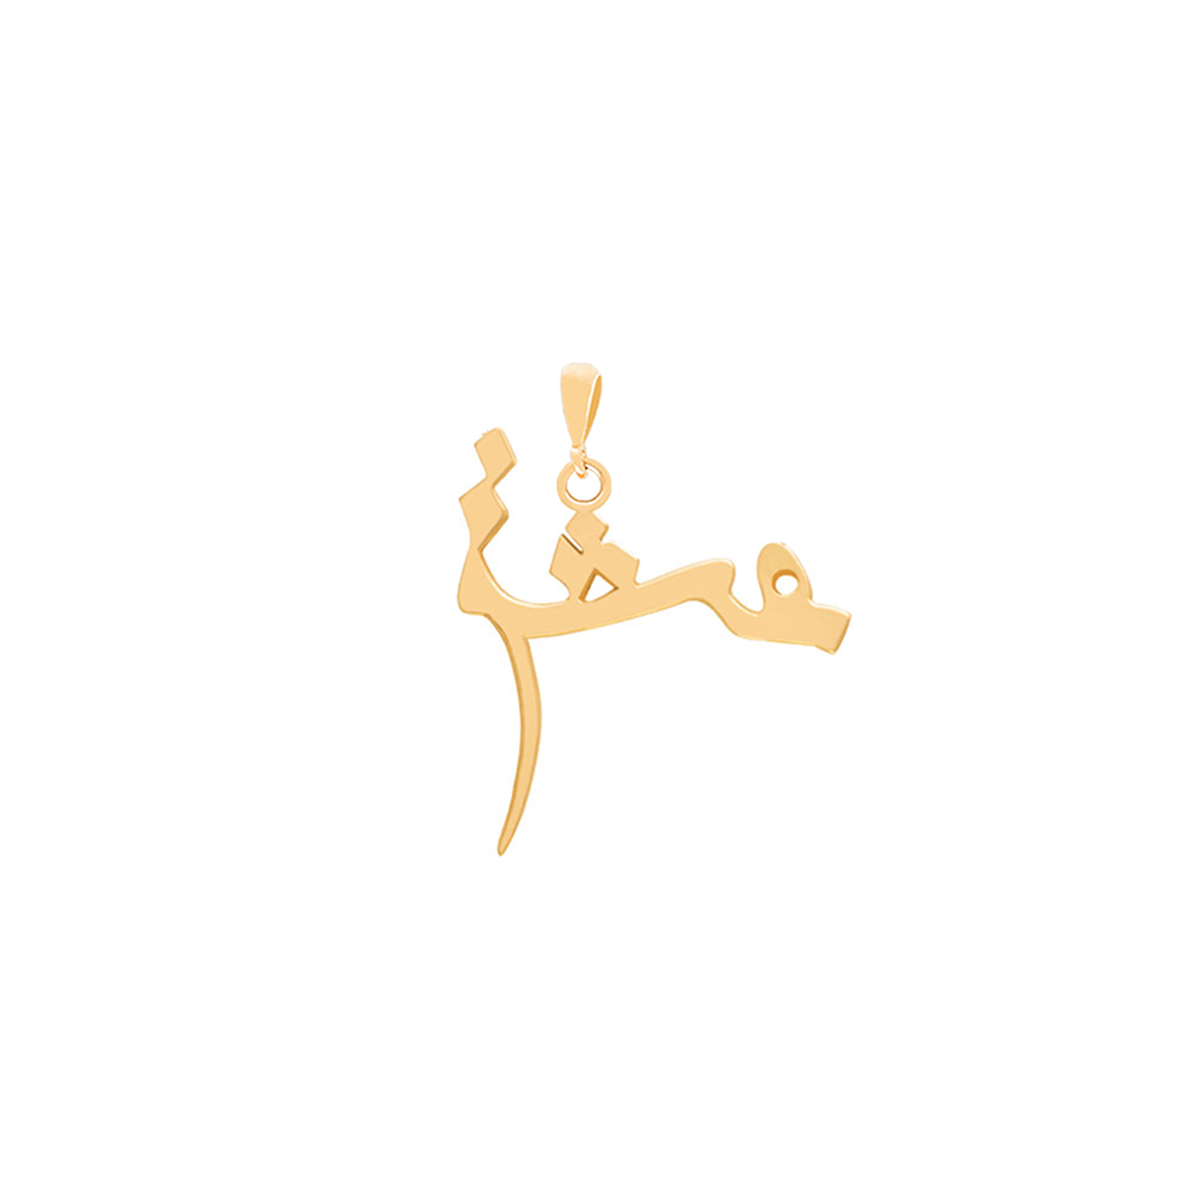 گردنبد طلا عشق کوچک